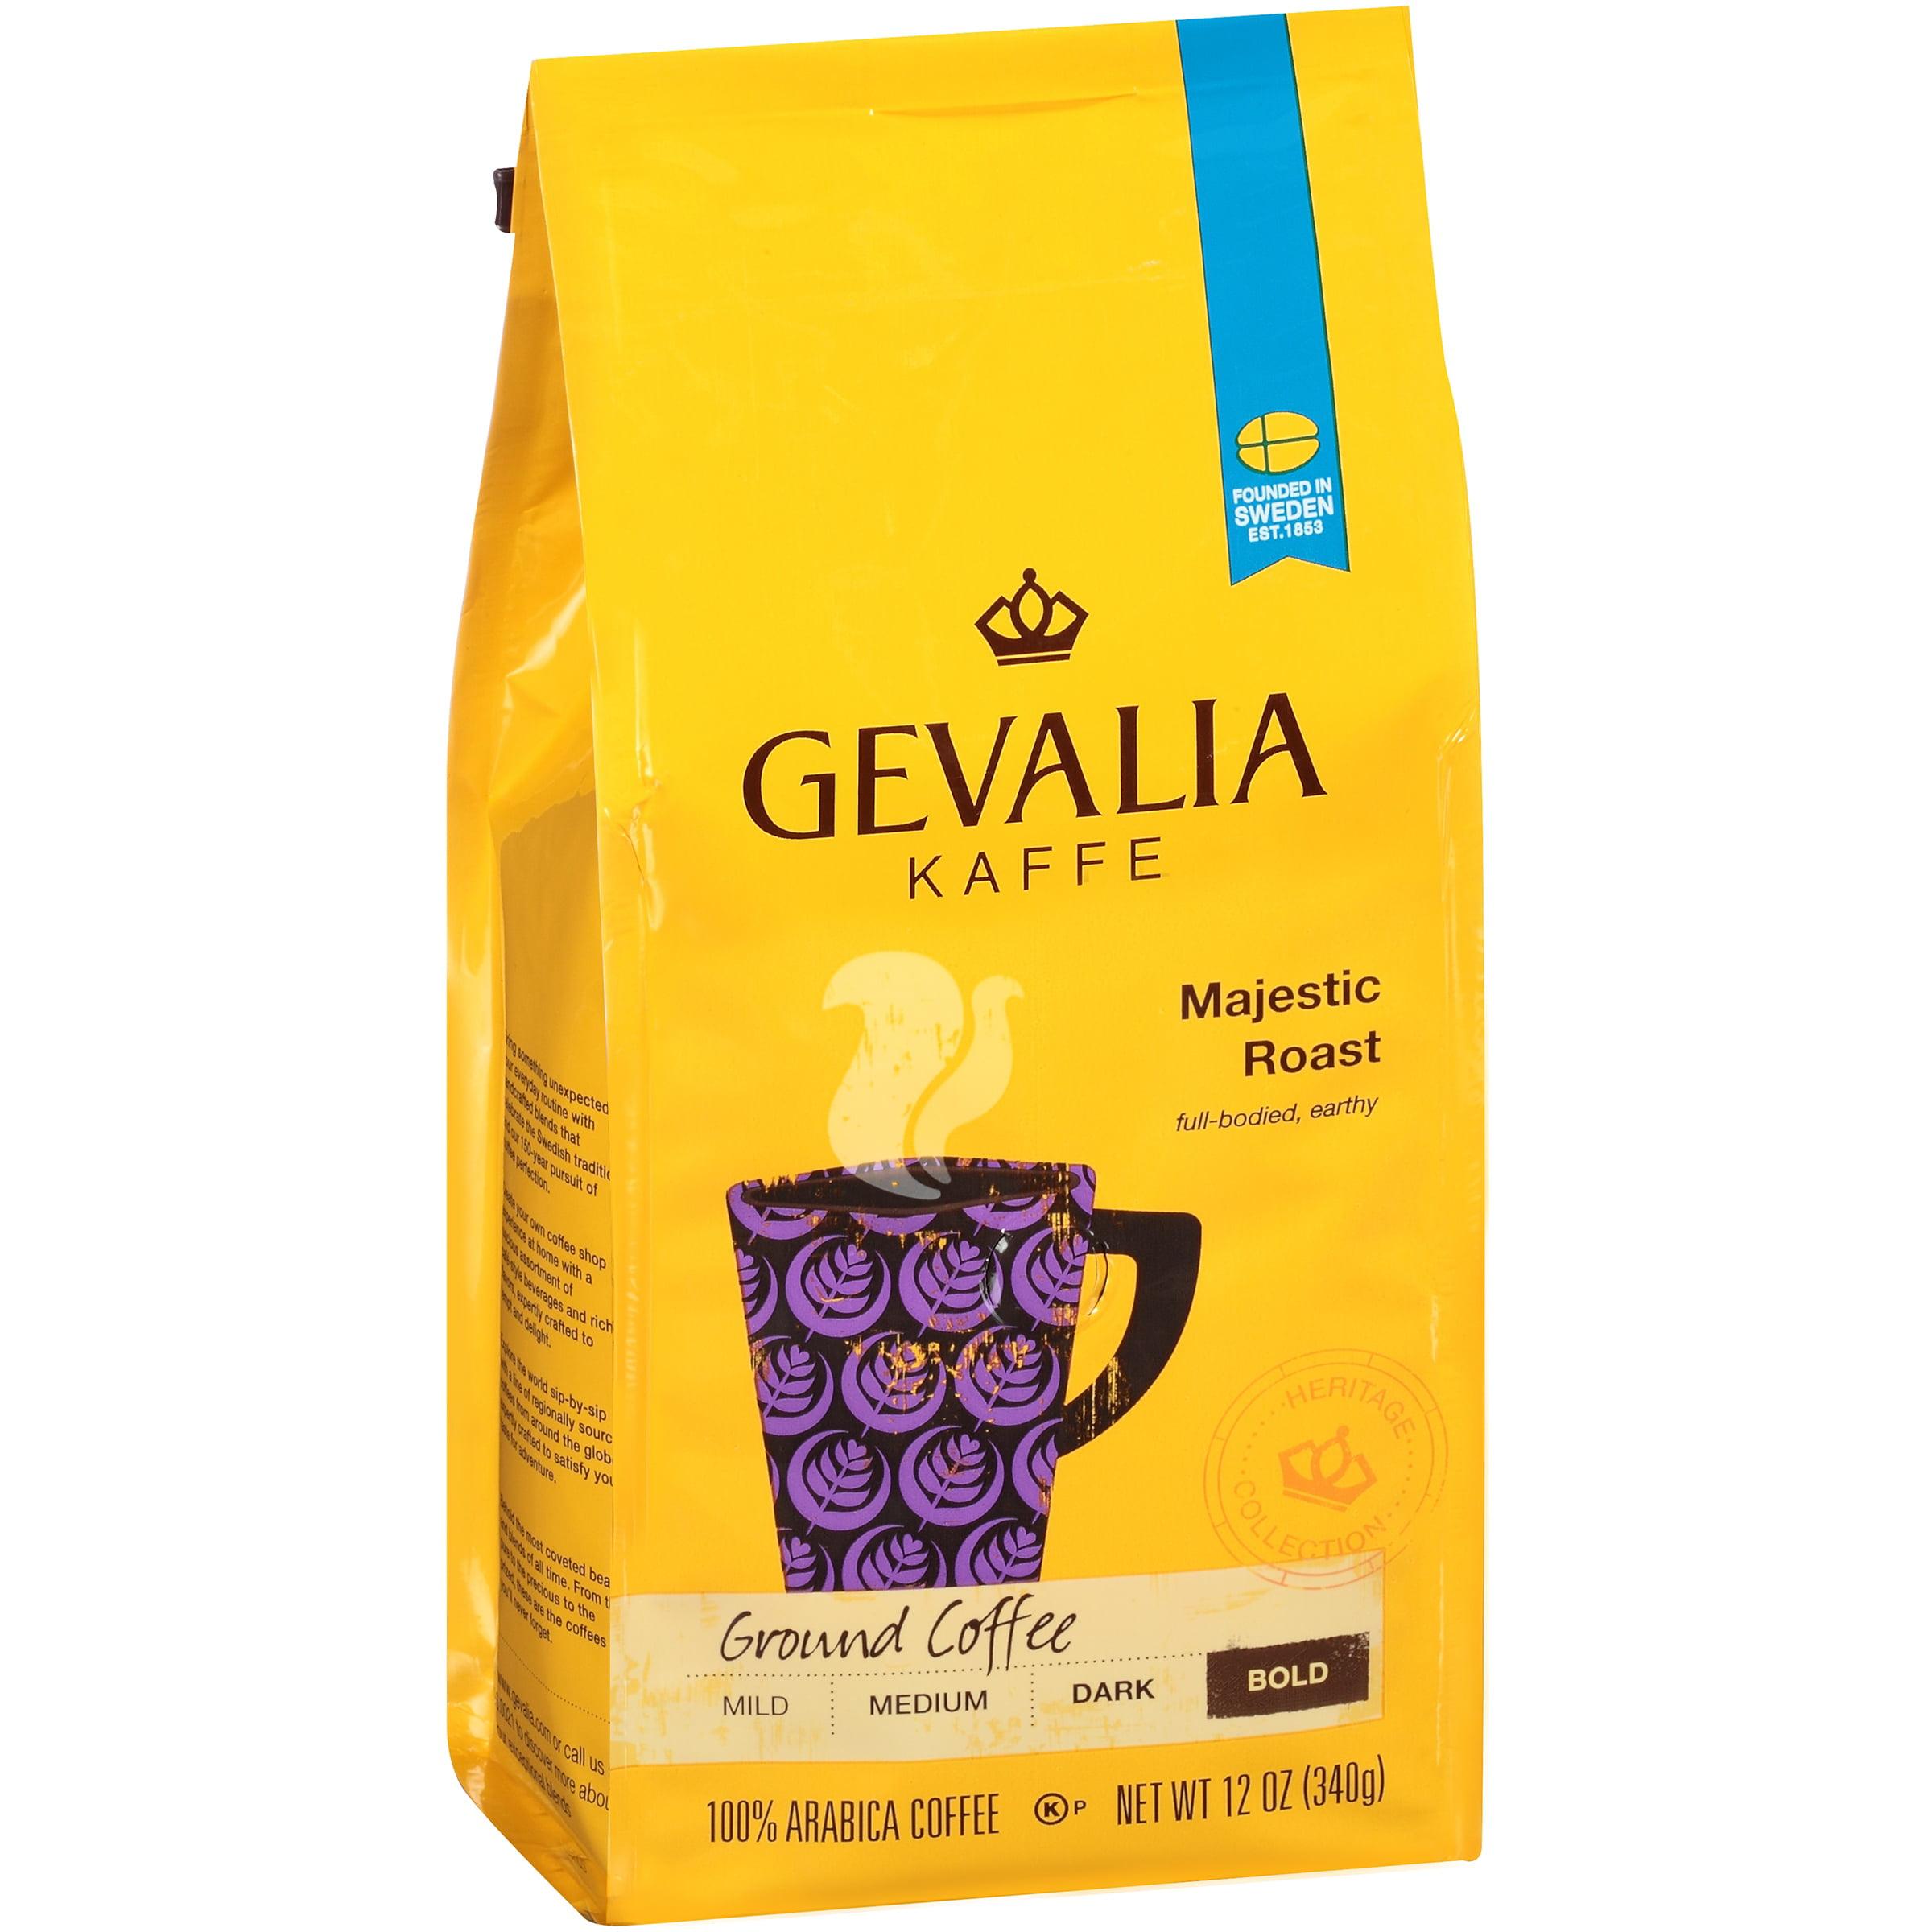 Coffee & Tea in Geneva, Canton of Geneva: Find TripAdvisor traveler reviews of Geneva Coffee & Tea and search by price, location, and more.